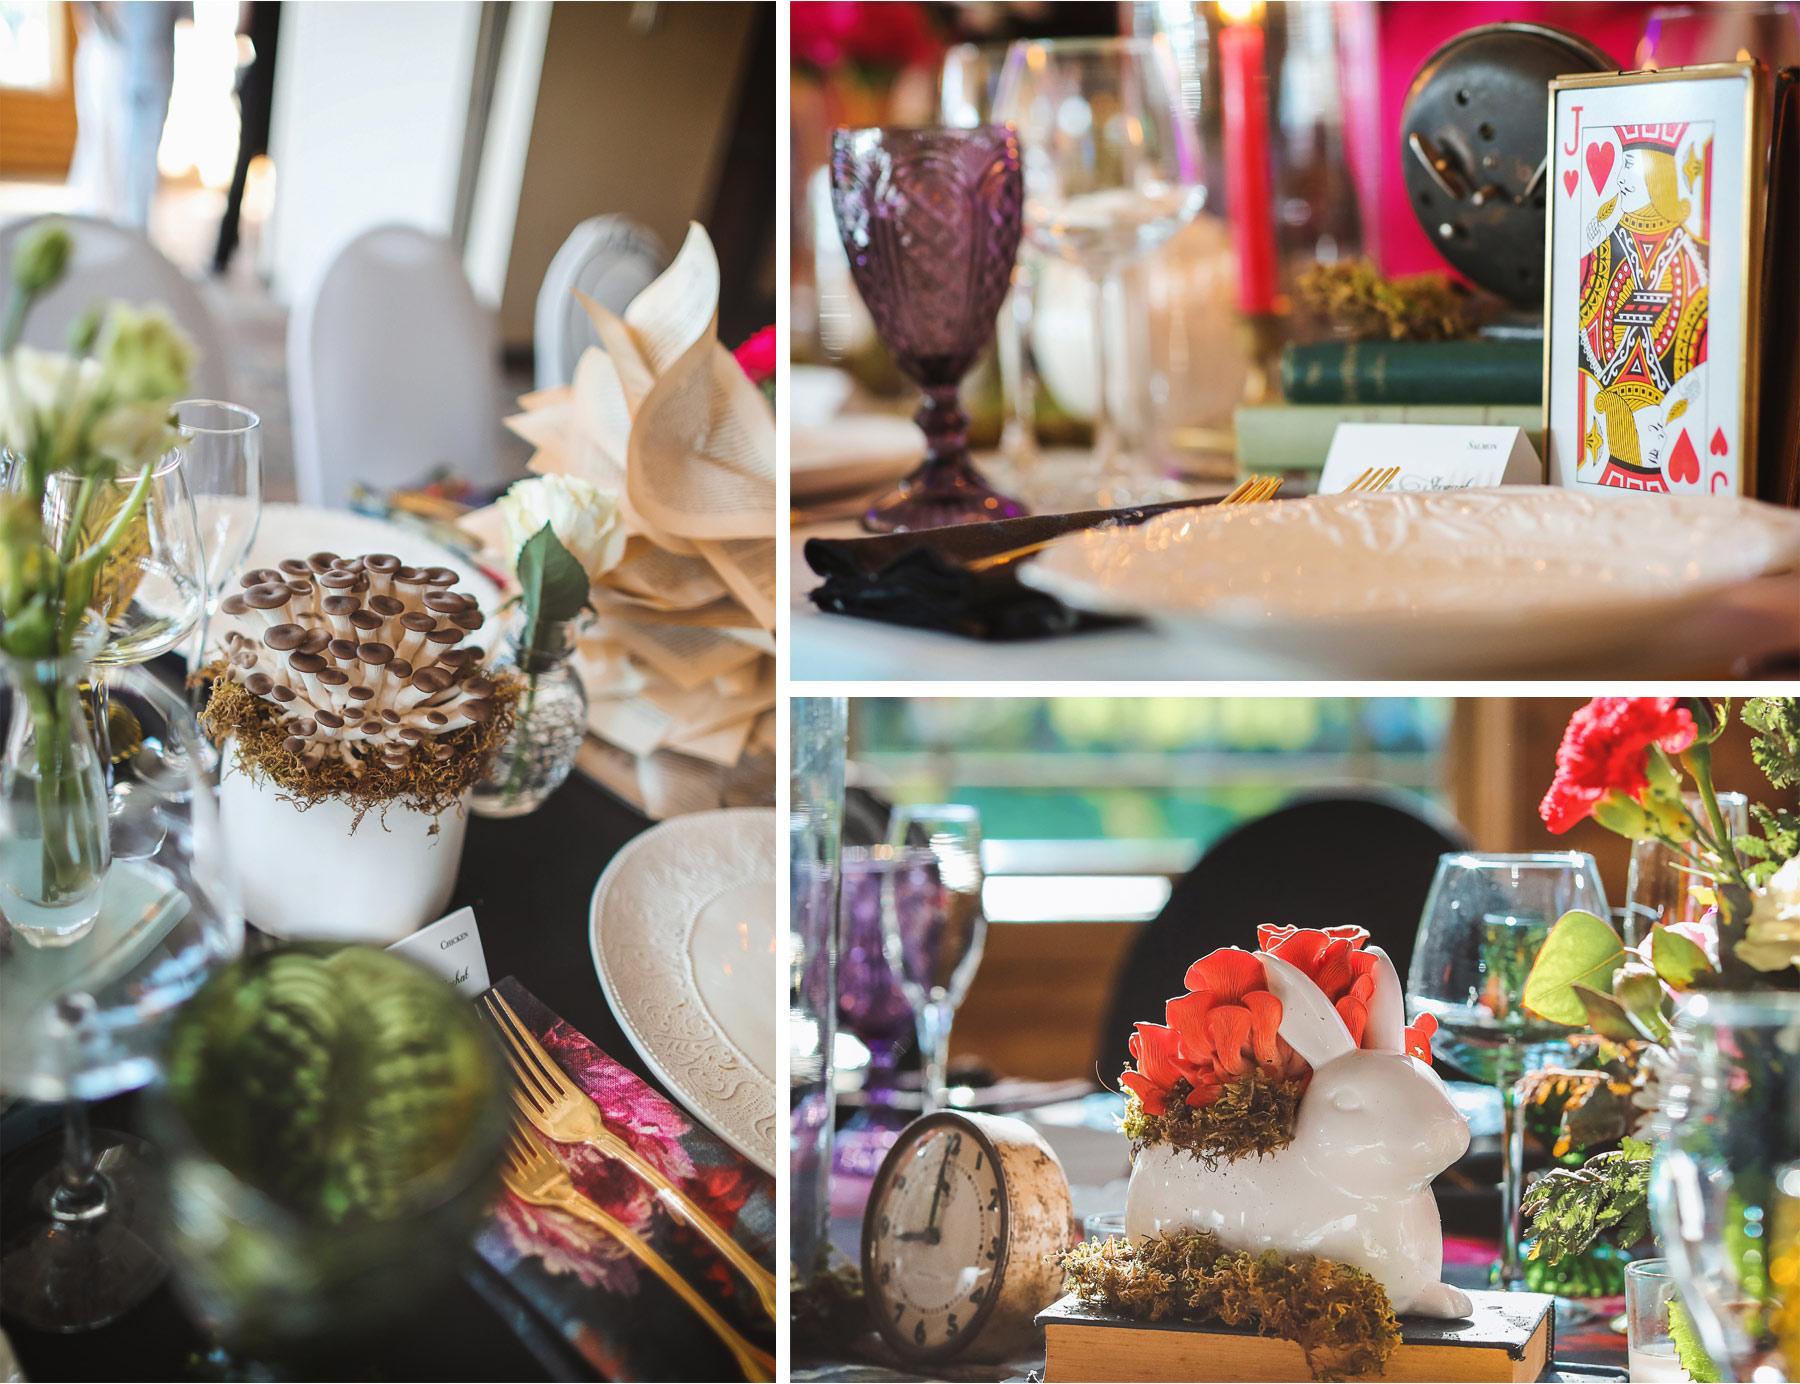 18-Vick-Photography-Wedding-Ottertail-Minnesota-Alice-in-Wonderland-Theme-Reception-Table-Decor-Mushrooms-White-Rabit-Tess-and-Greg.jpg